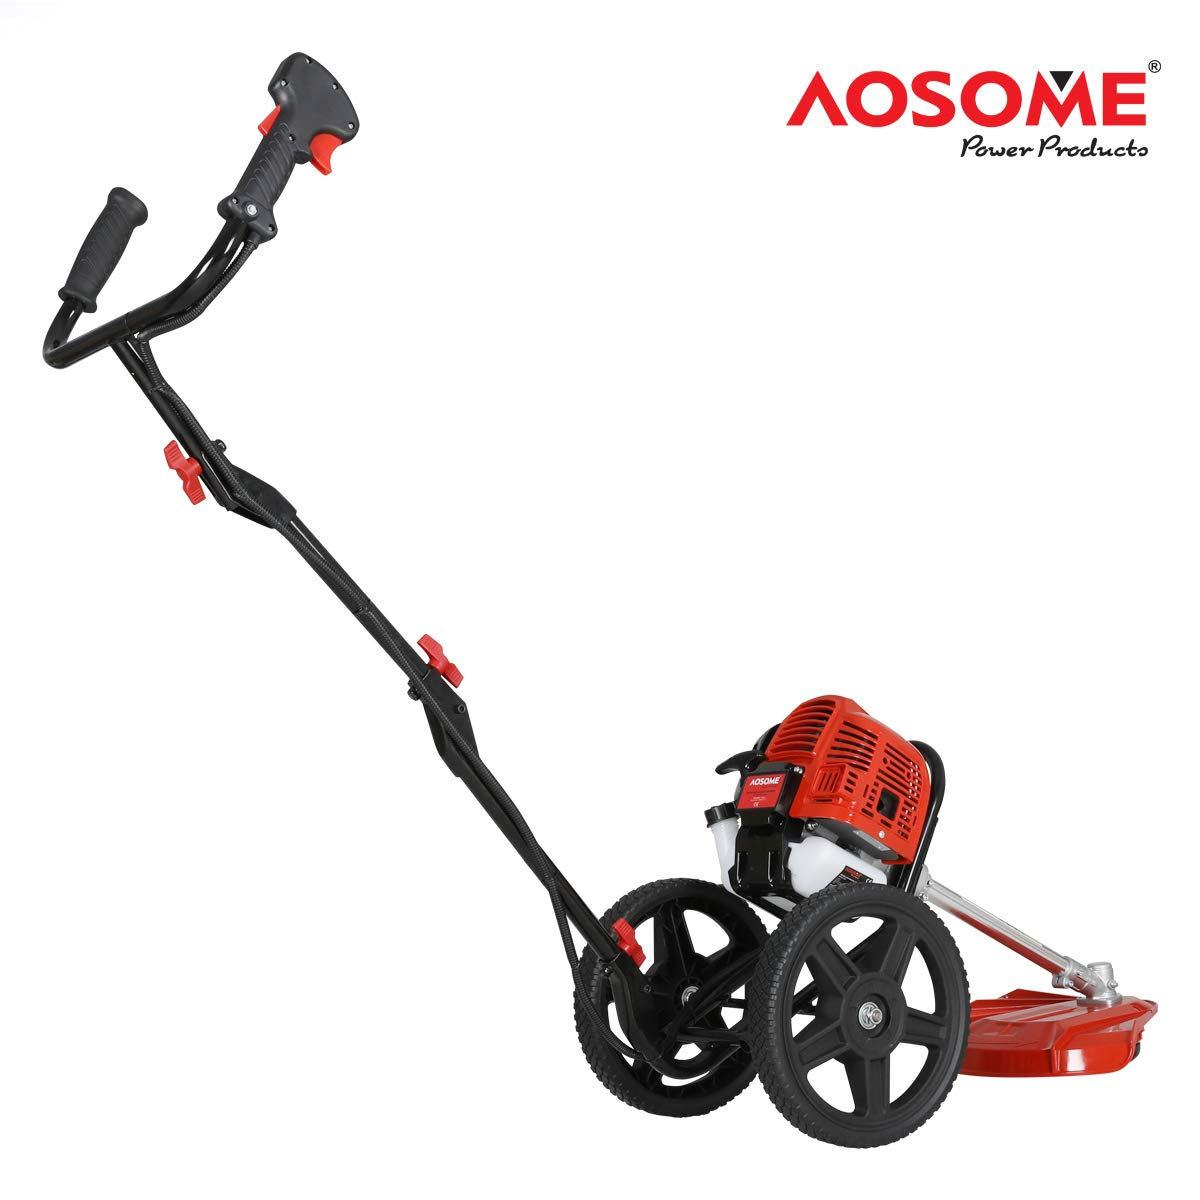 AOSOME - Cortador de césped de jardín con Ruedas (52 CC, 2 ...